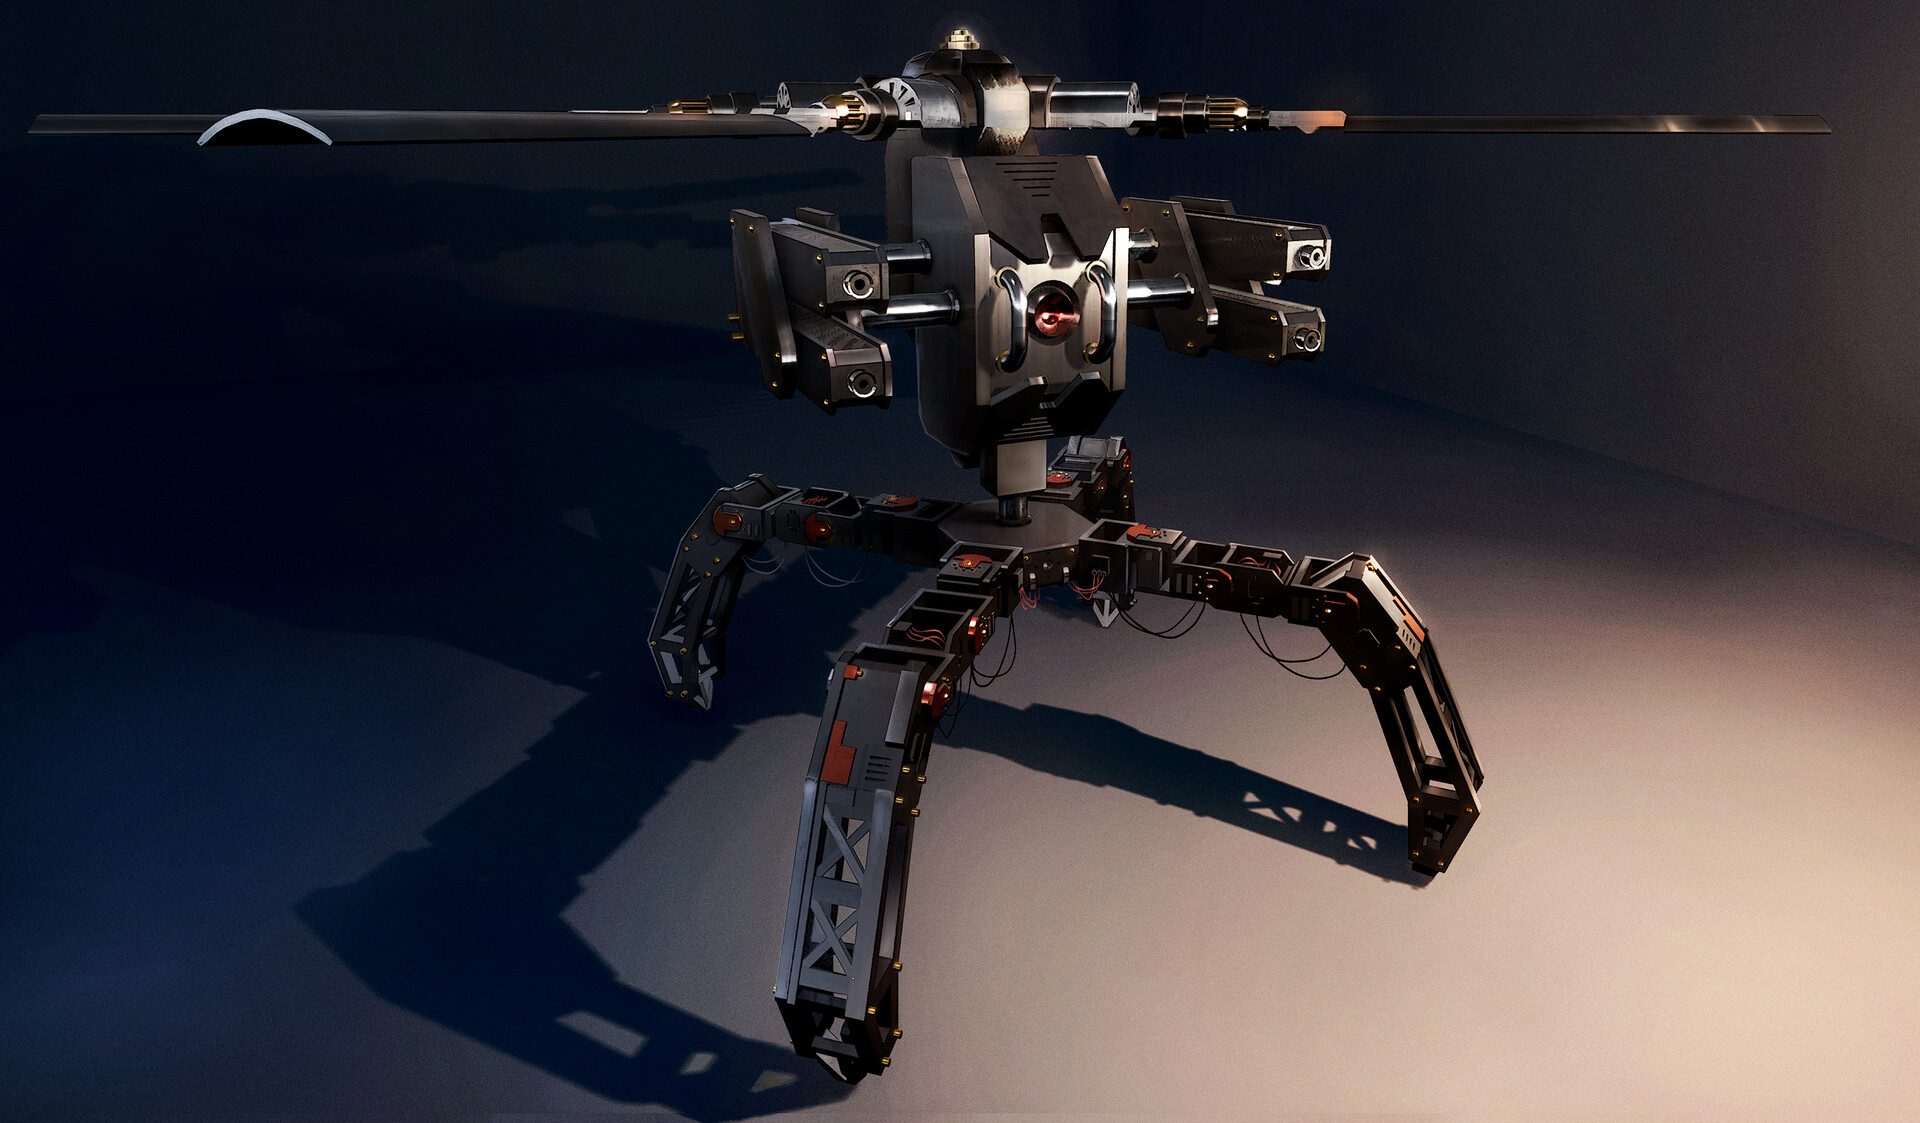 Emelie johansson flying drone presentation